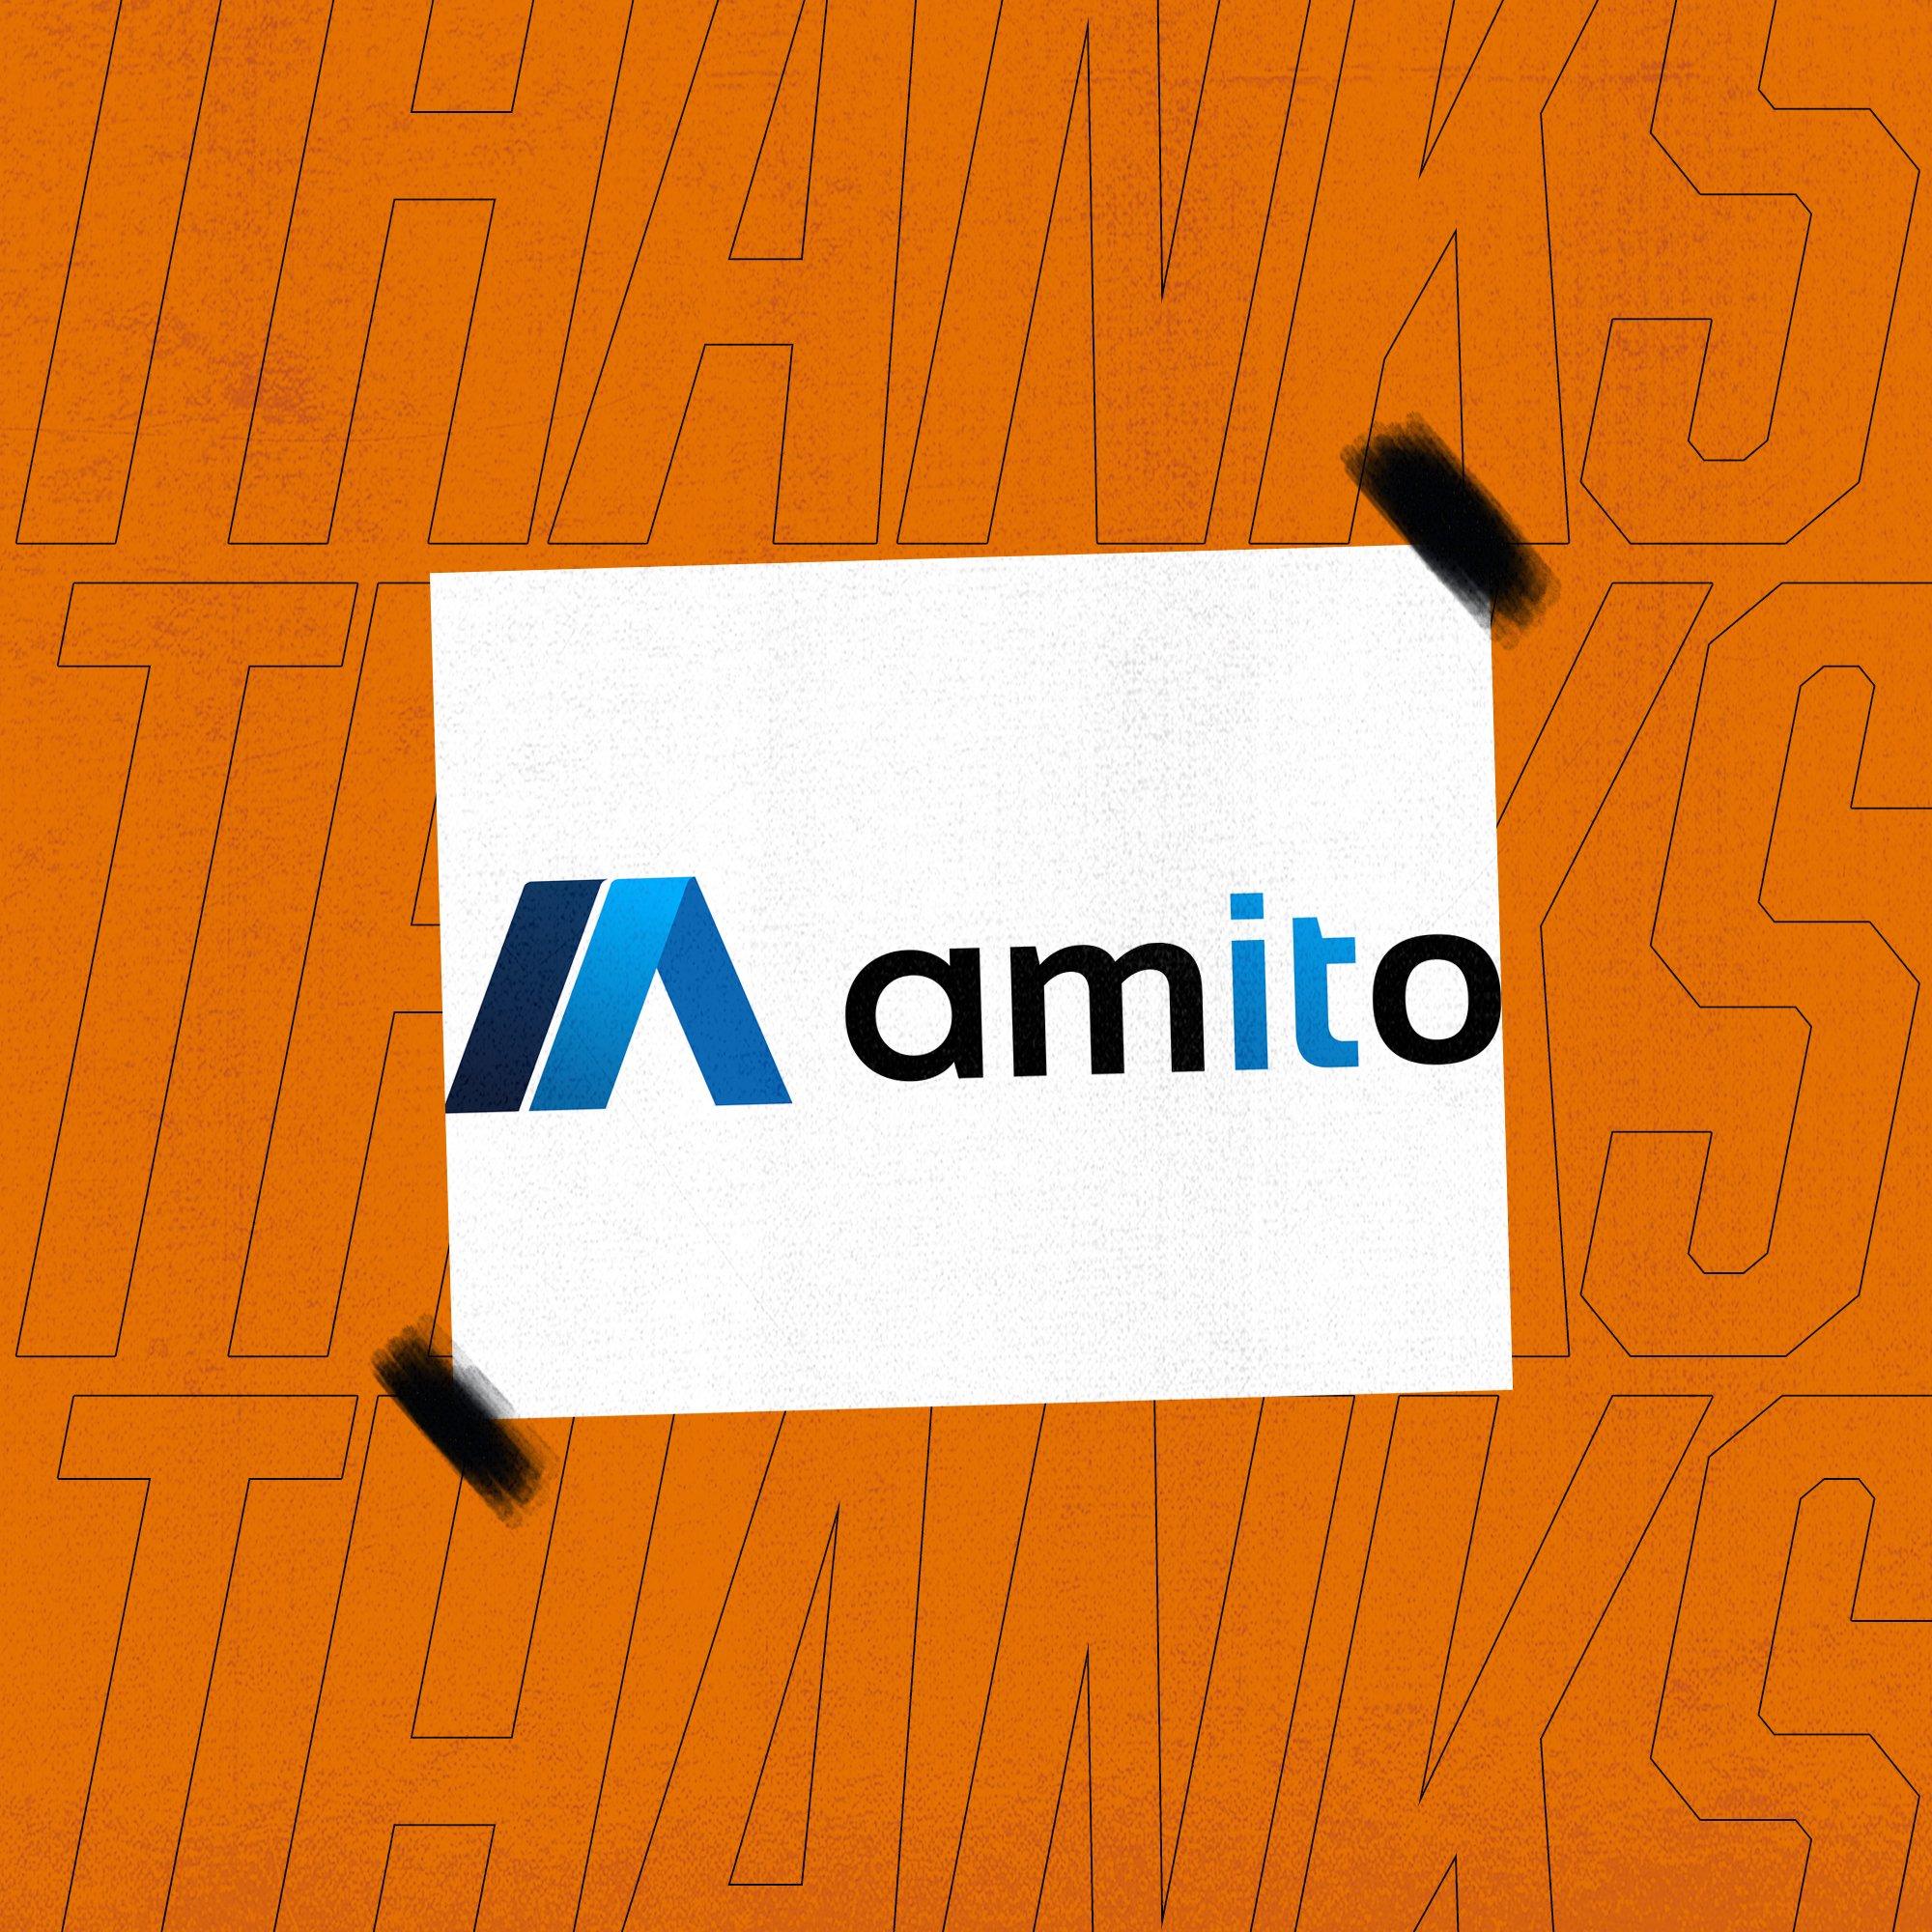 Thank You Amito!